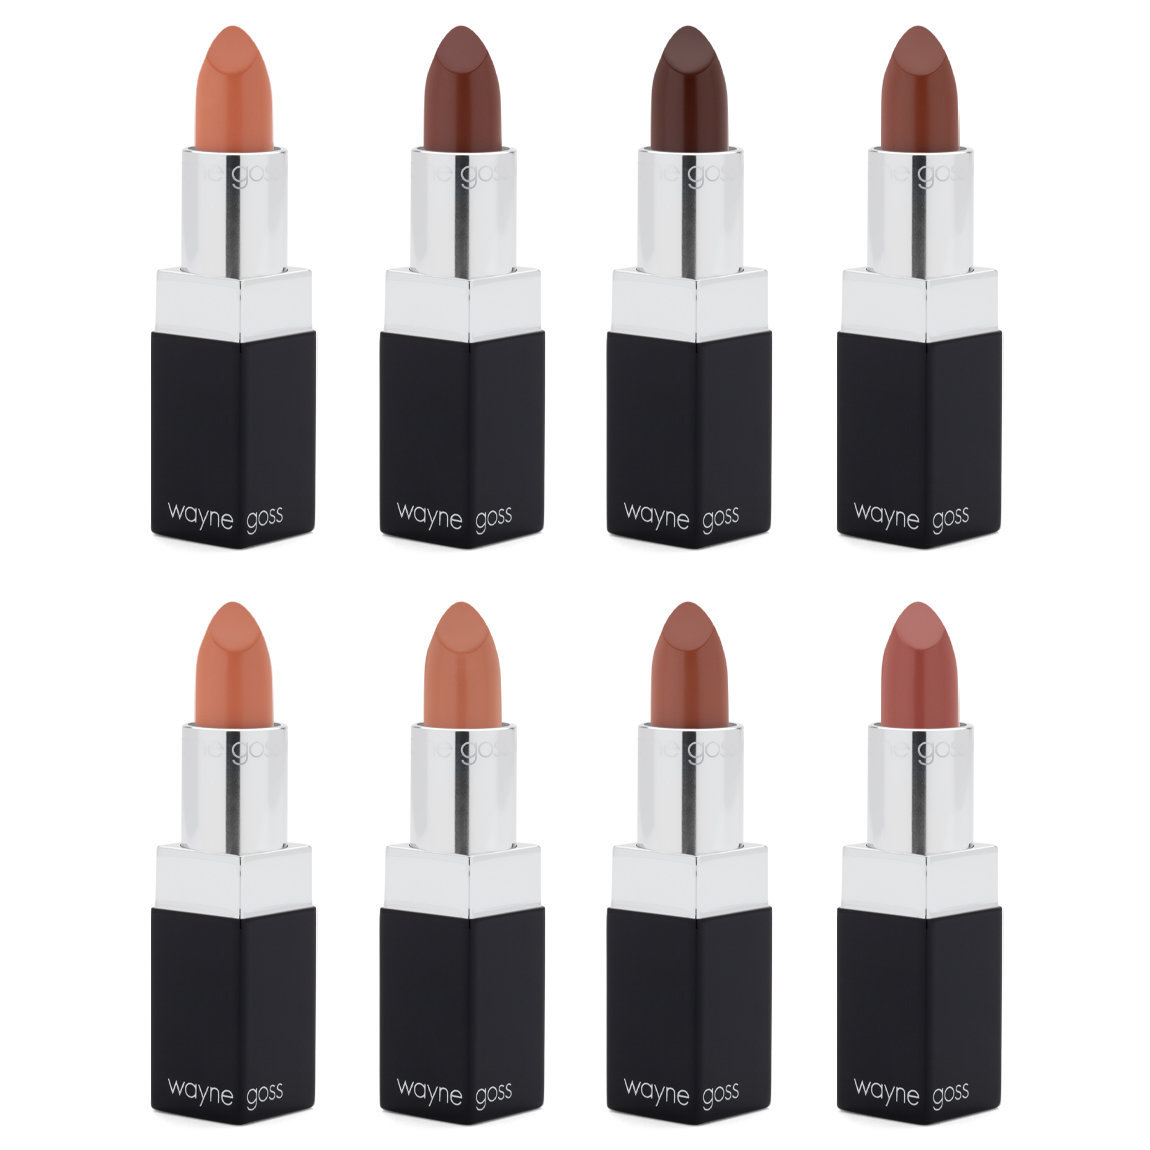 Wayne Goss The Nude Luxury Cream Lipstick Collection alternative view 1 - product swatch.